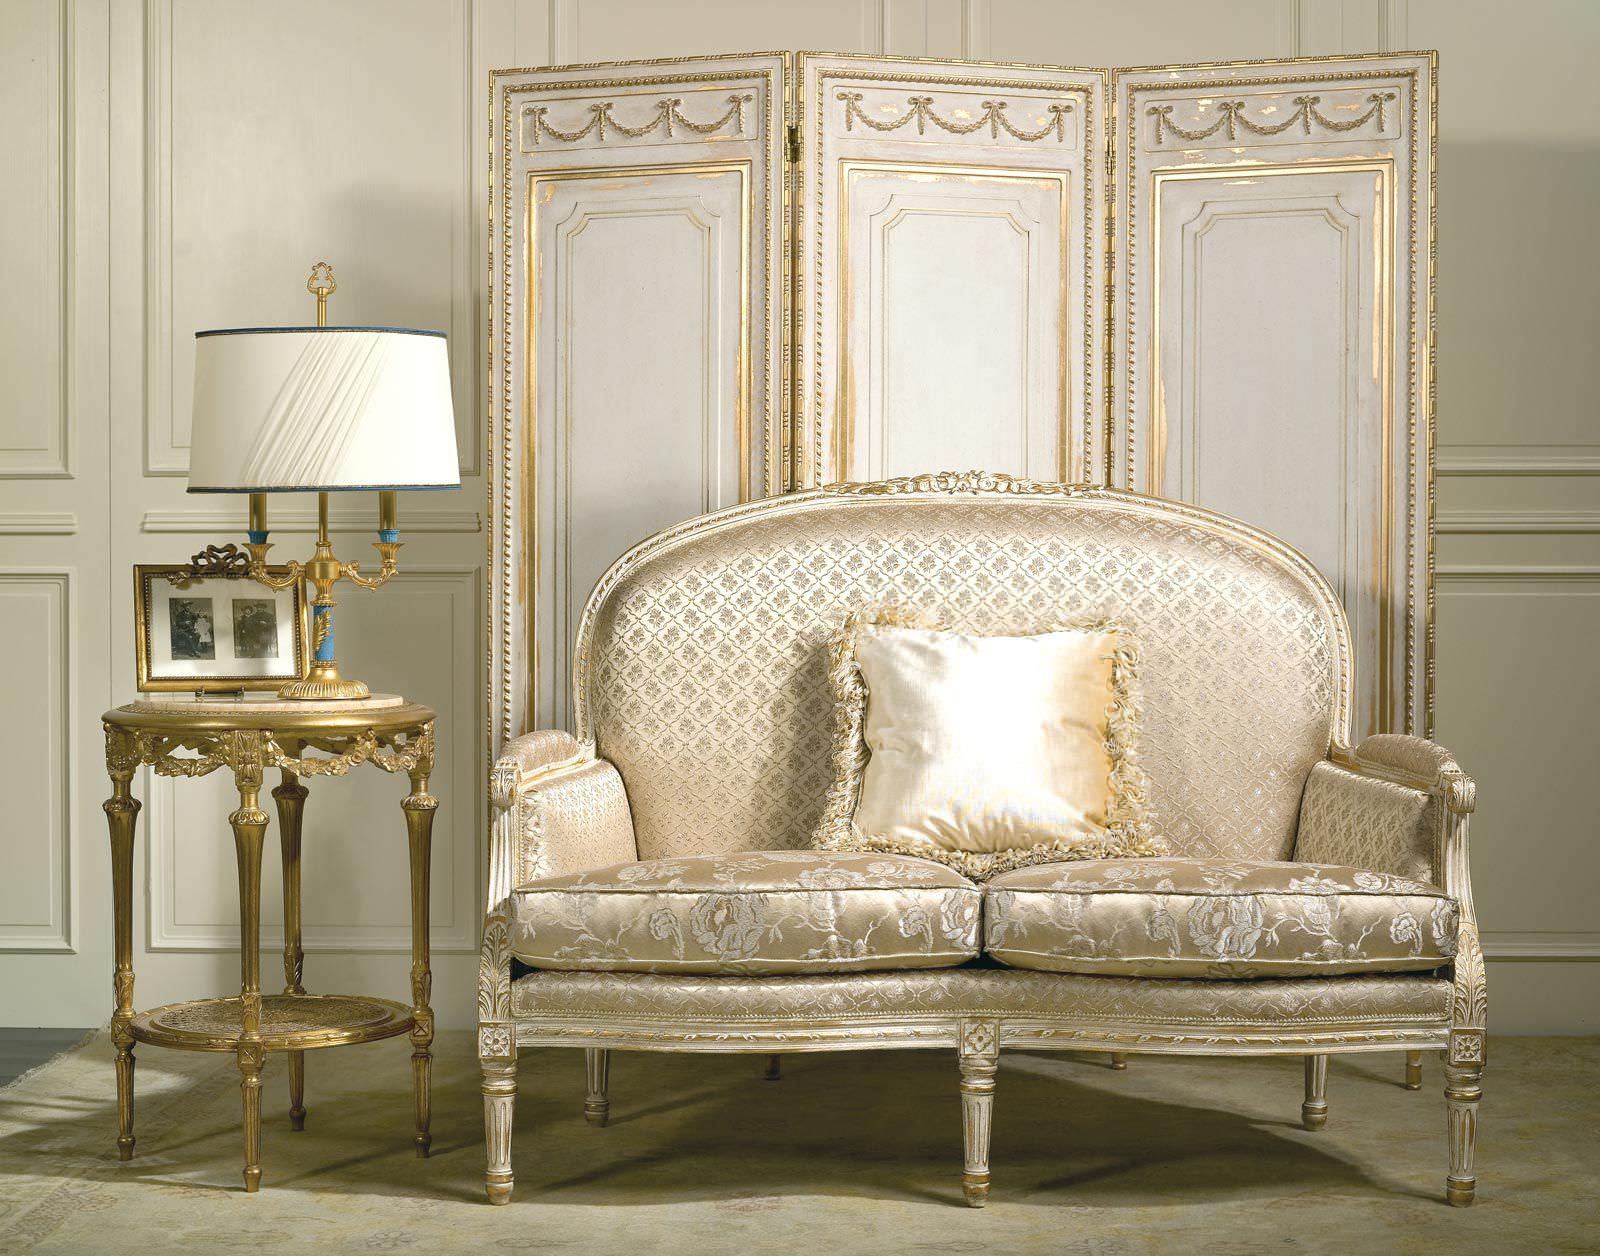 Classic Sofa / Fabric / 2 Seater / Beige RIALTO VIMERCATI MEDA LUXURY  CLASSIC FURNITURE